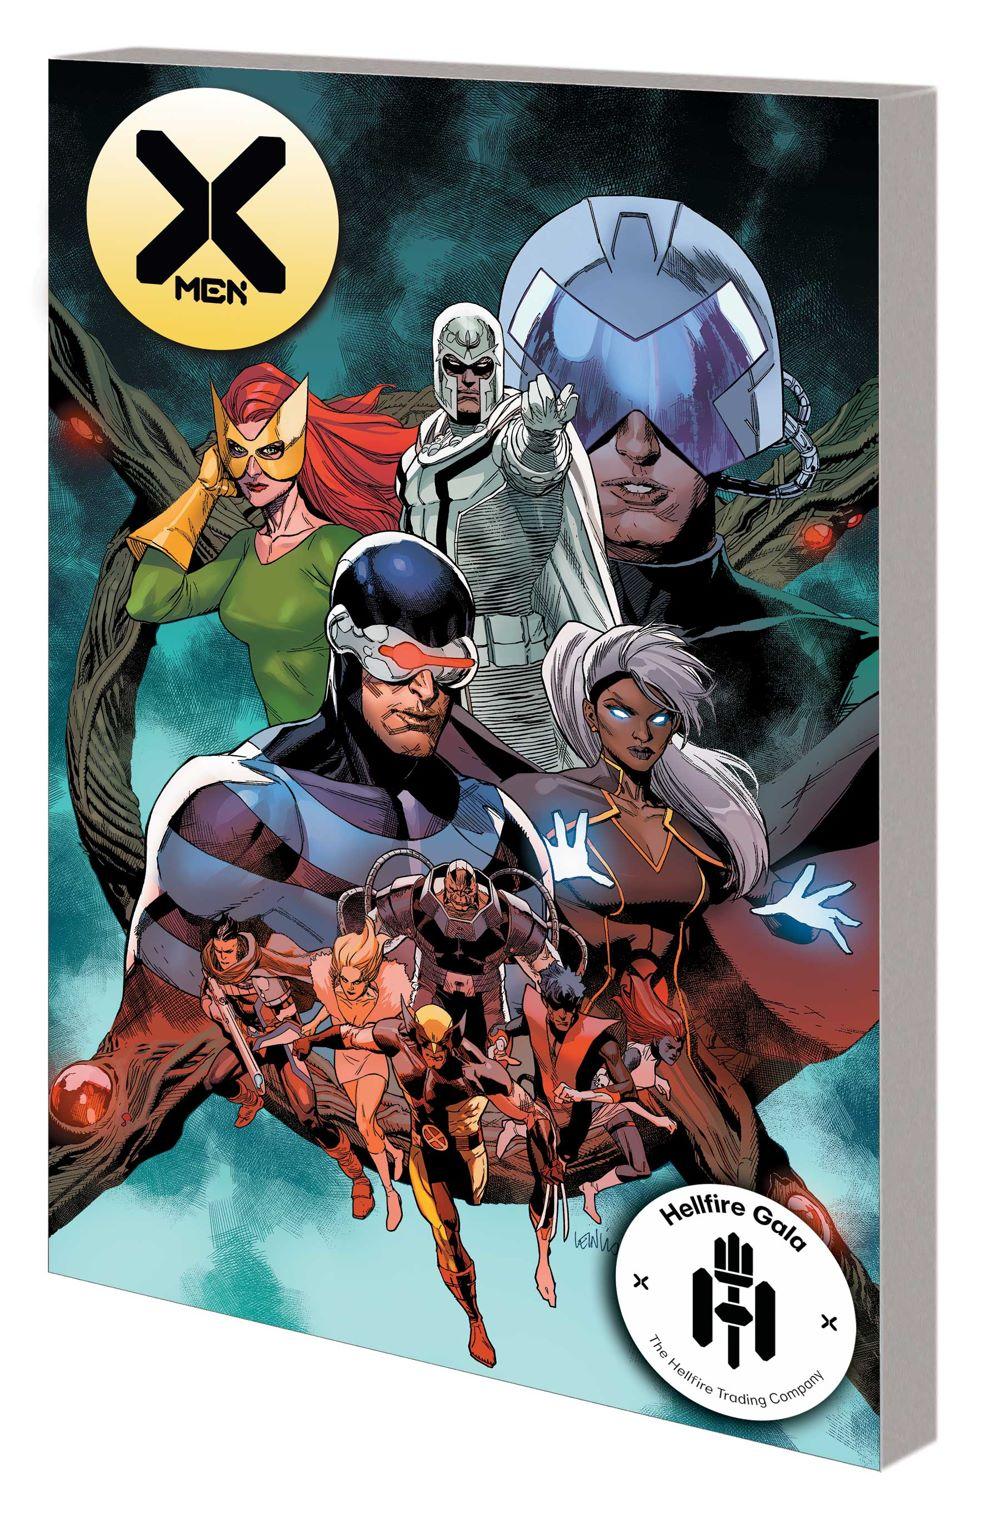 XMEN_HELLFIRE_TPB Marvel Comics August 2021 Solicitations